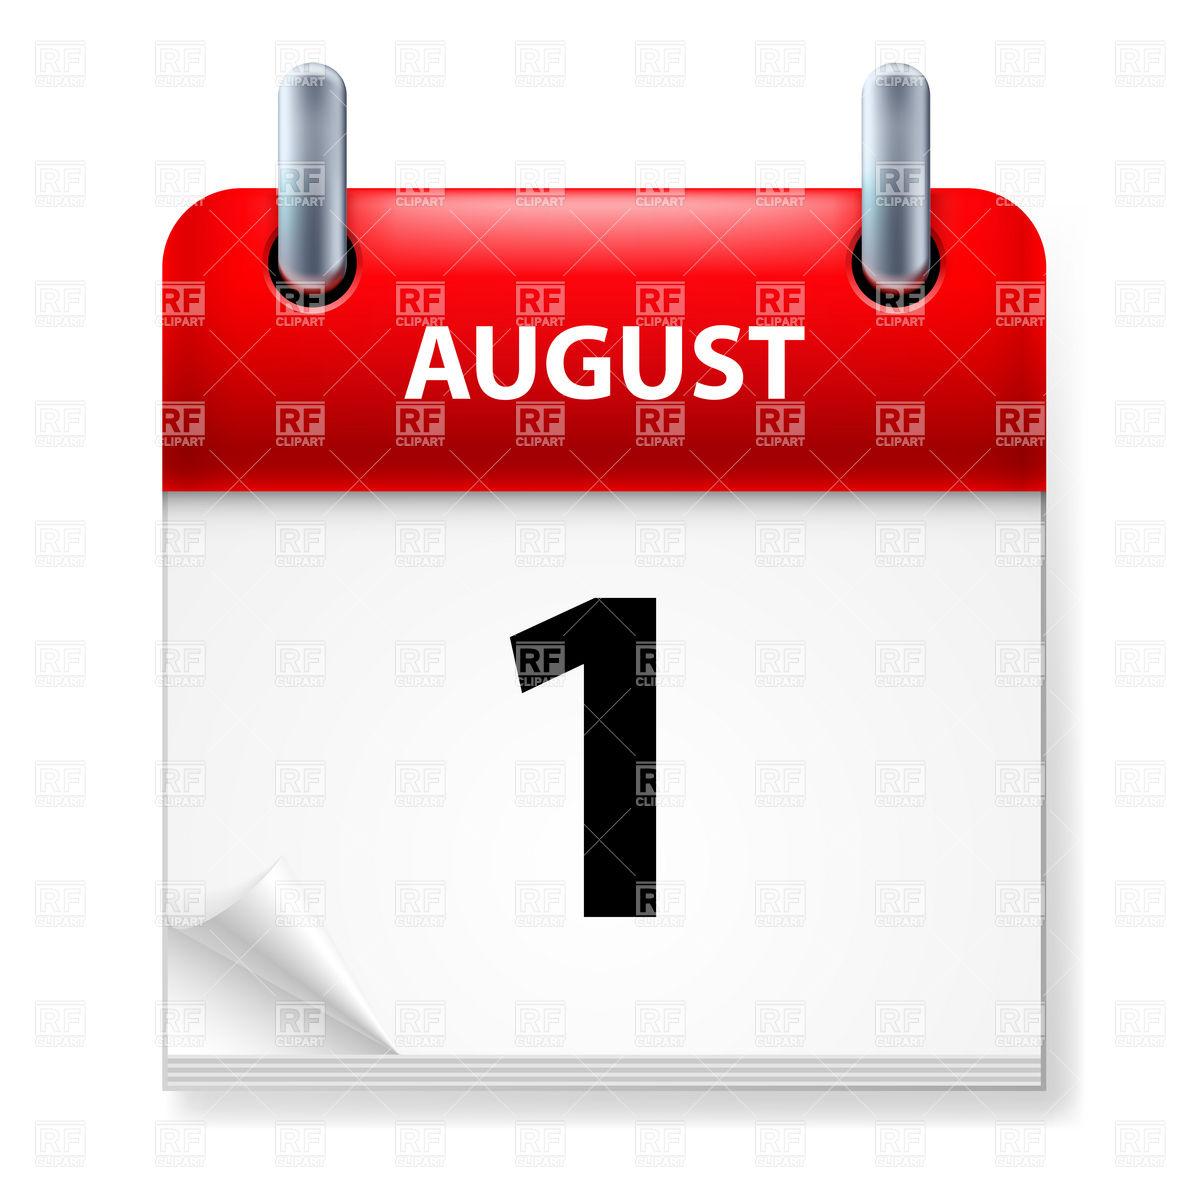 Clipart calendar august 2015 clip art freeuse Free clipart for august calendar - ClipartFest clip art freeuse